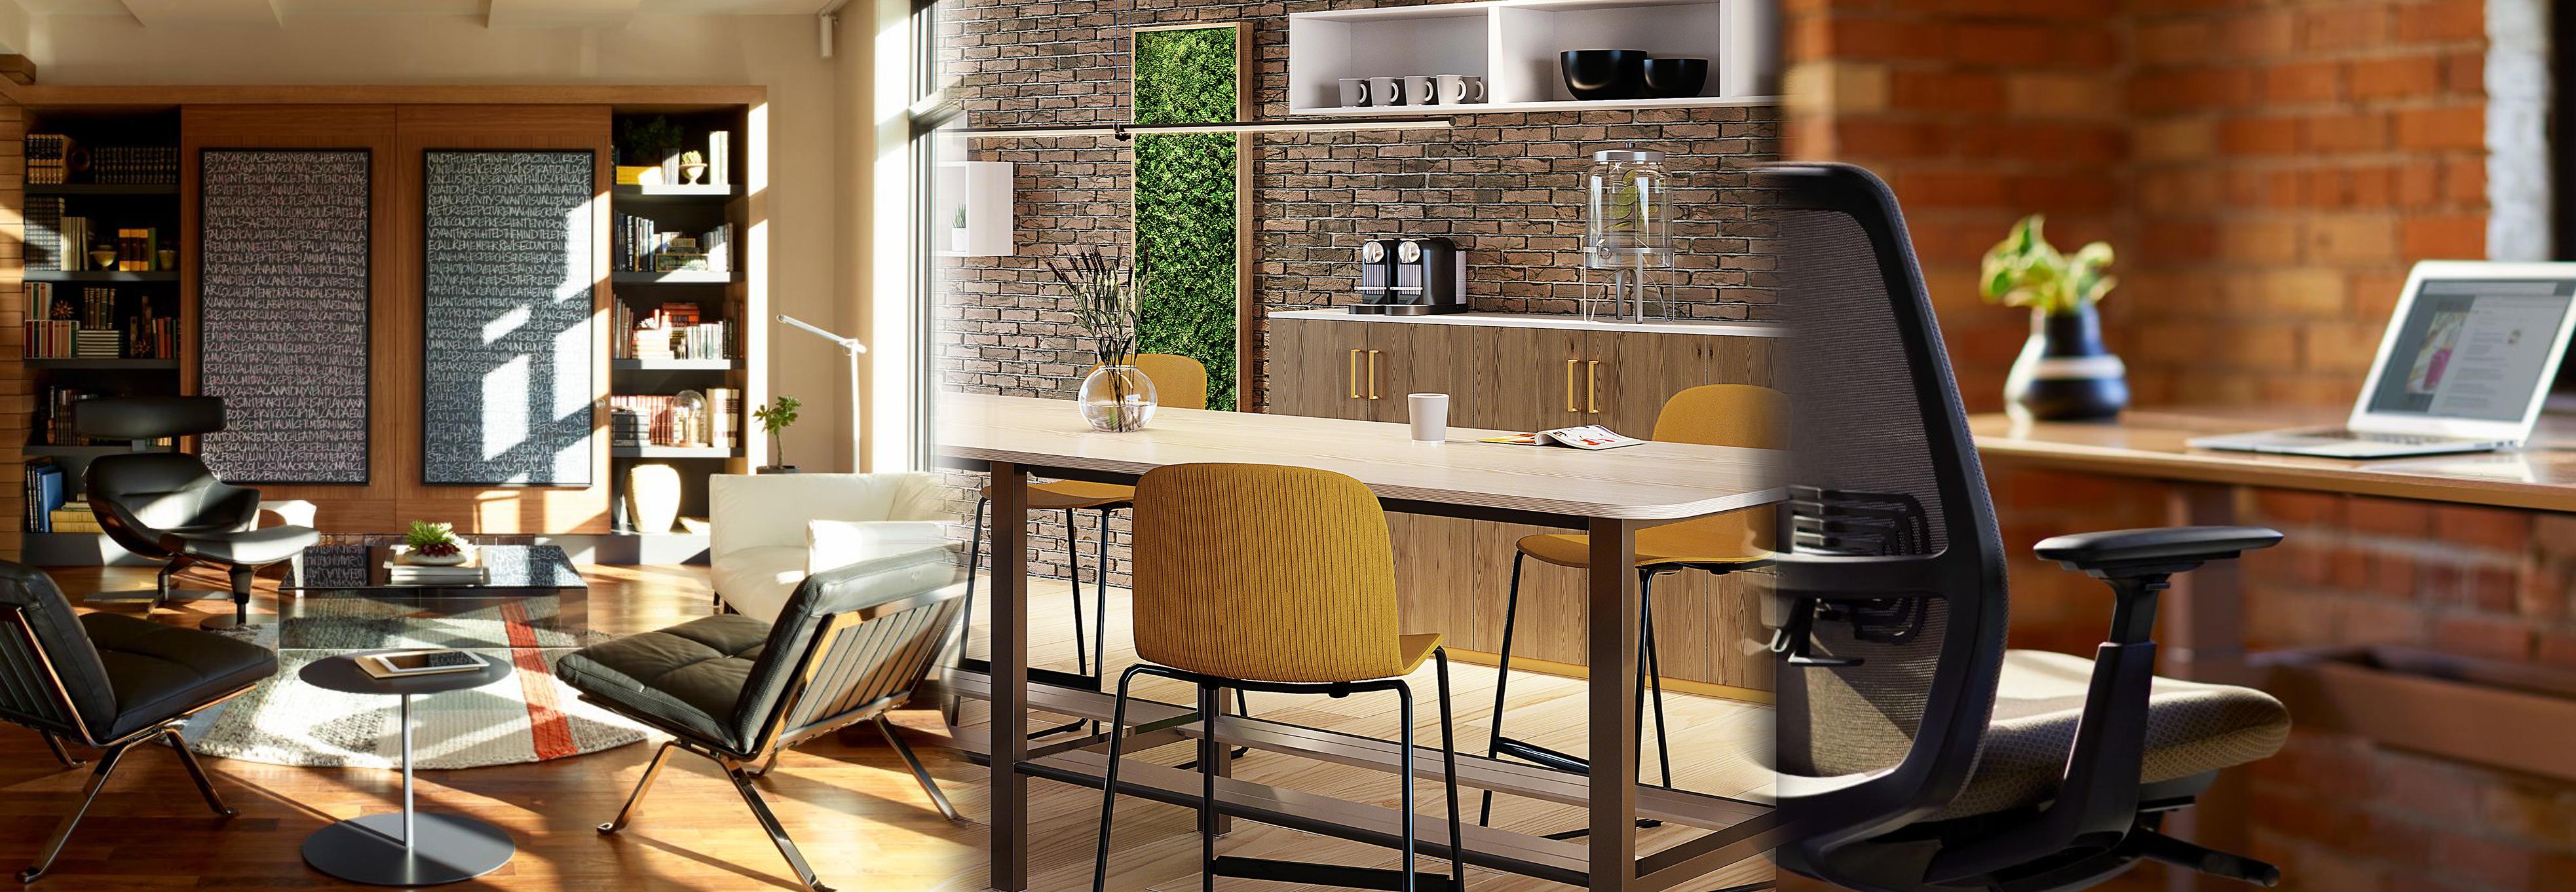 resimercial workspace design